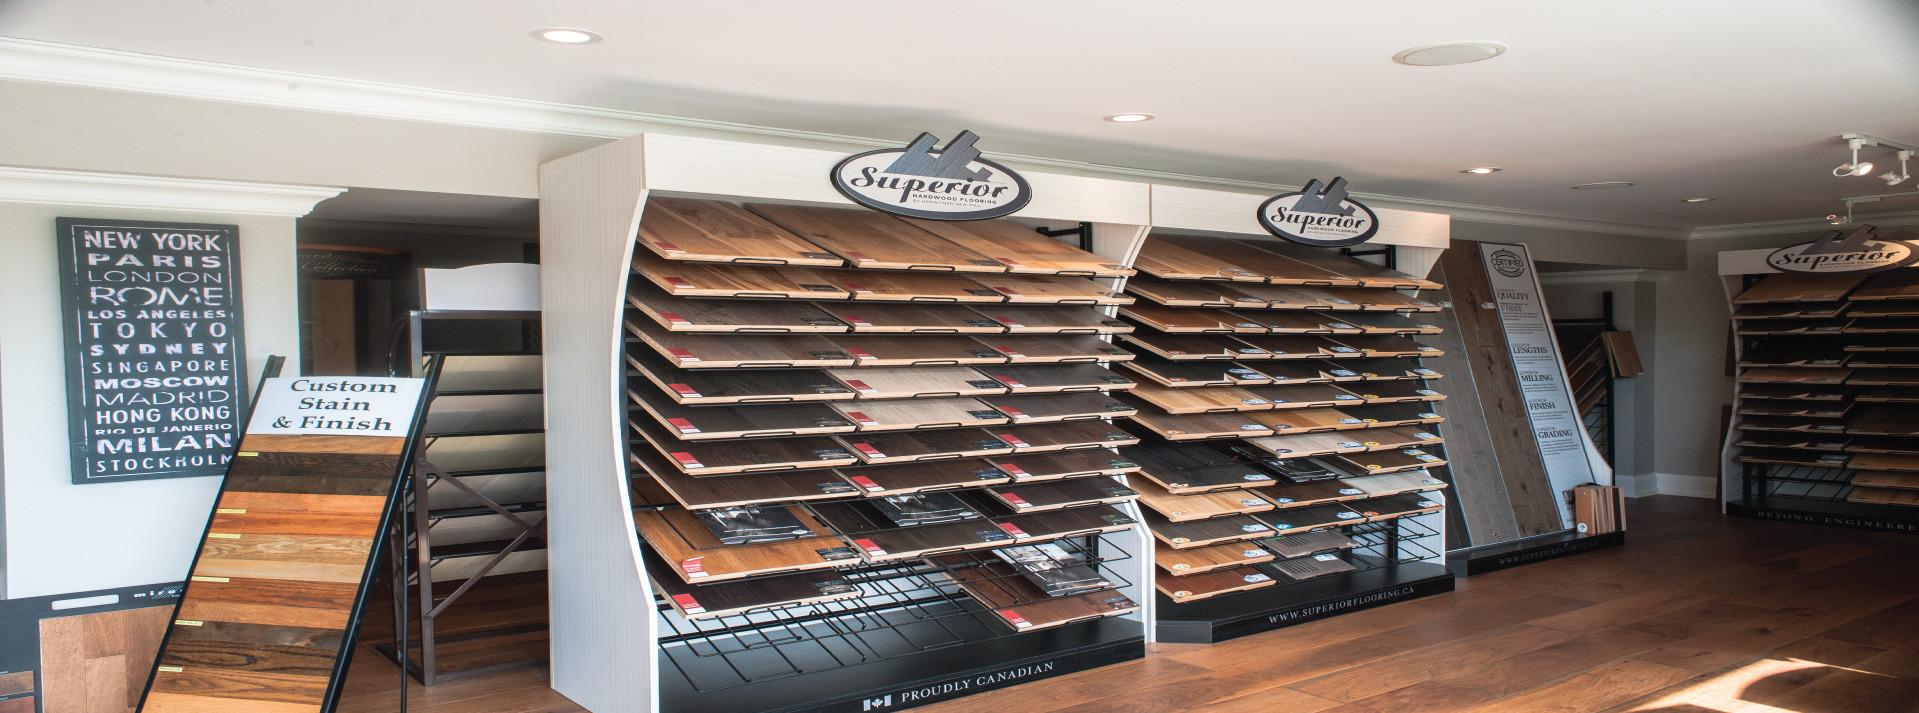 s m hardwood flooring of higgins hardwood flooring in peterborough oshawa lindsay ajax in read more